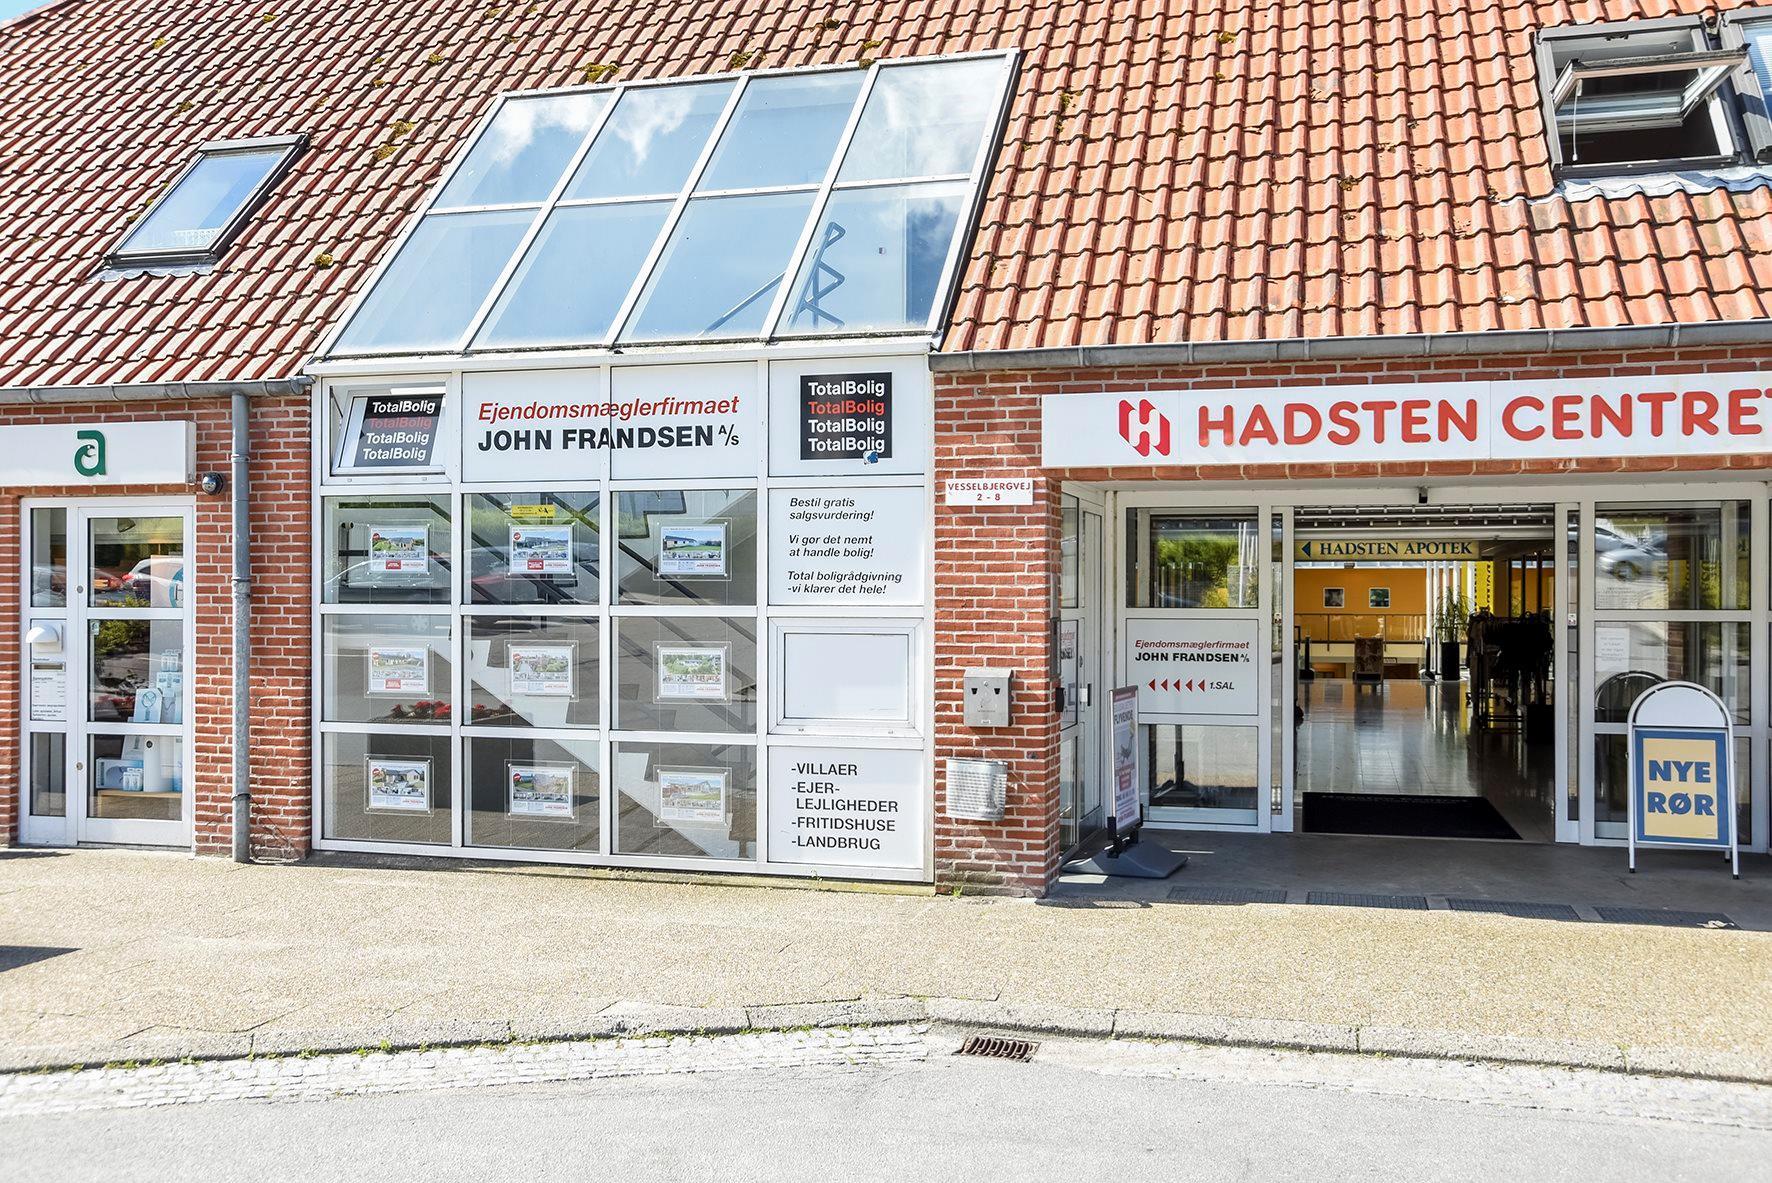 Hadsten